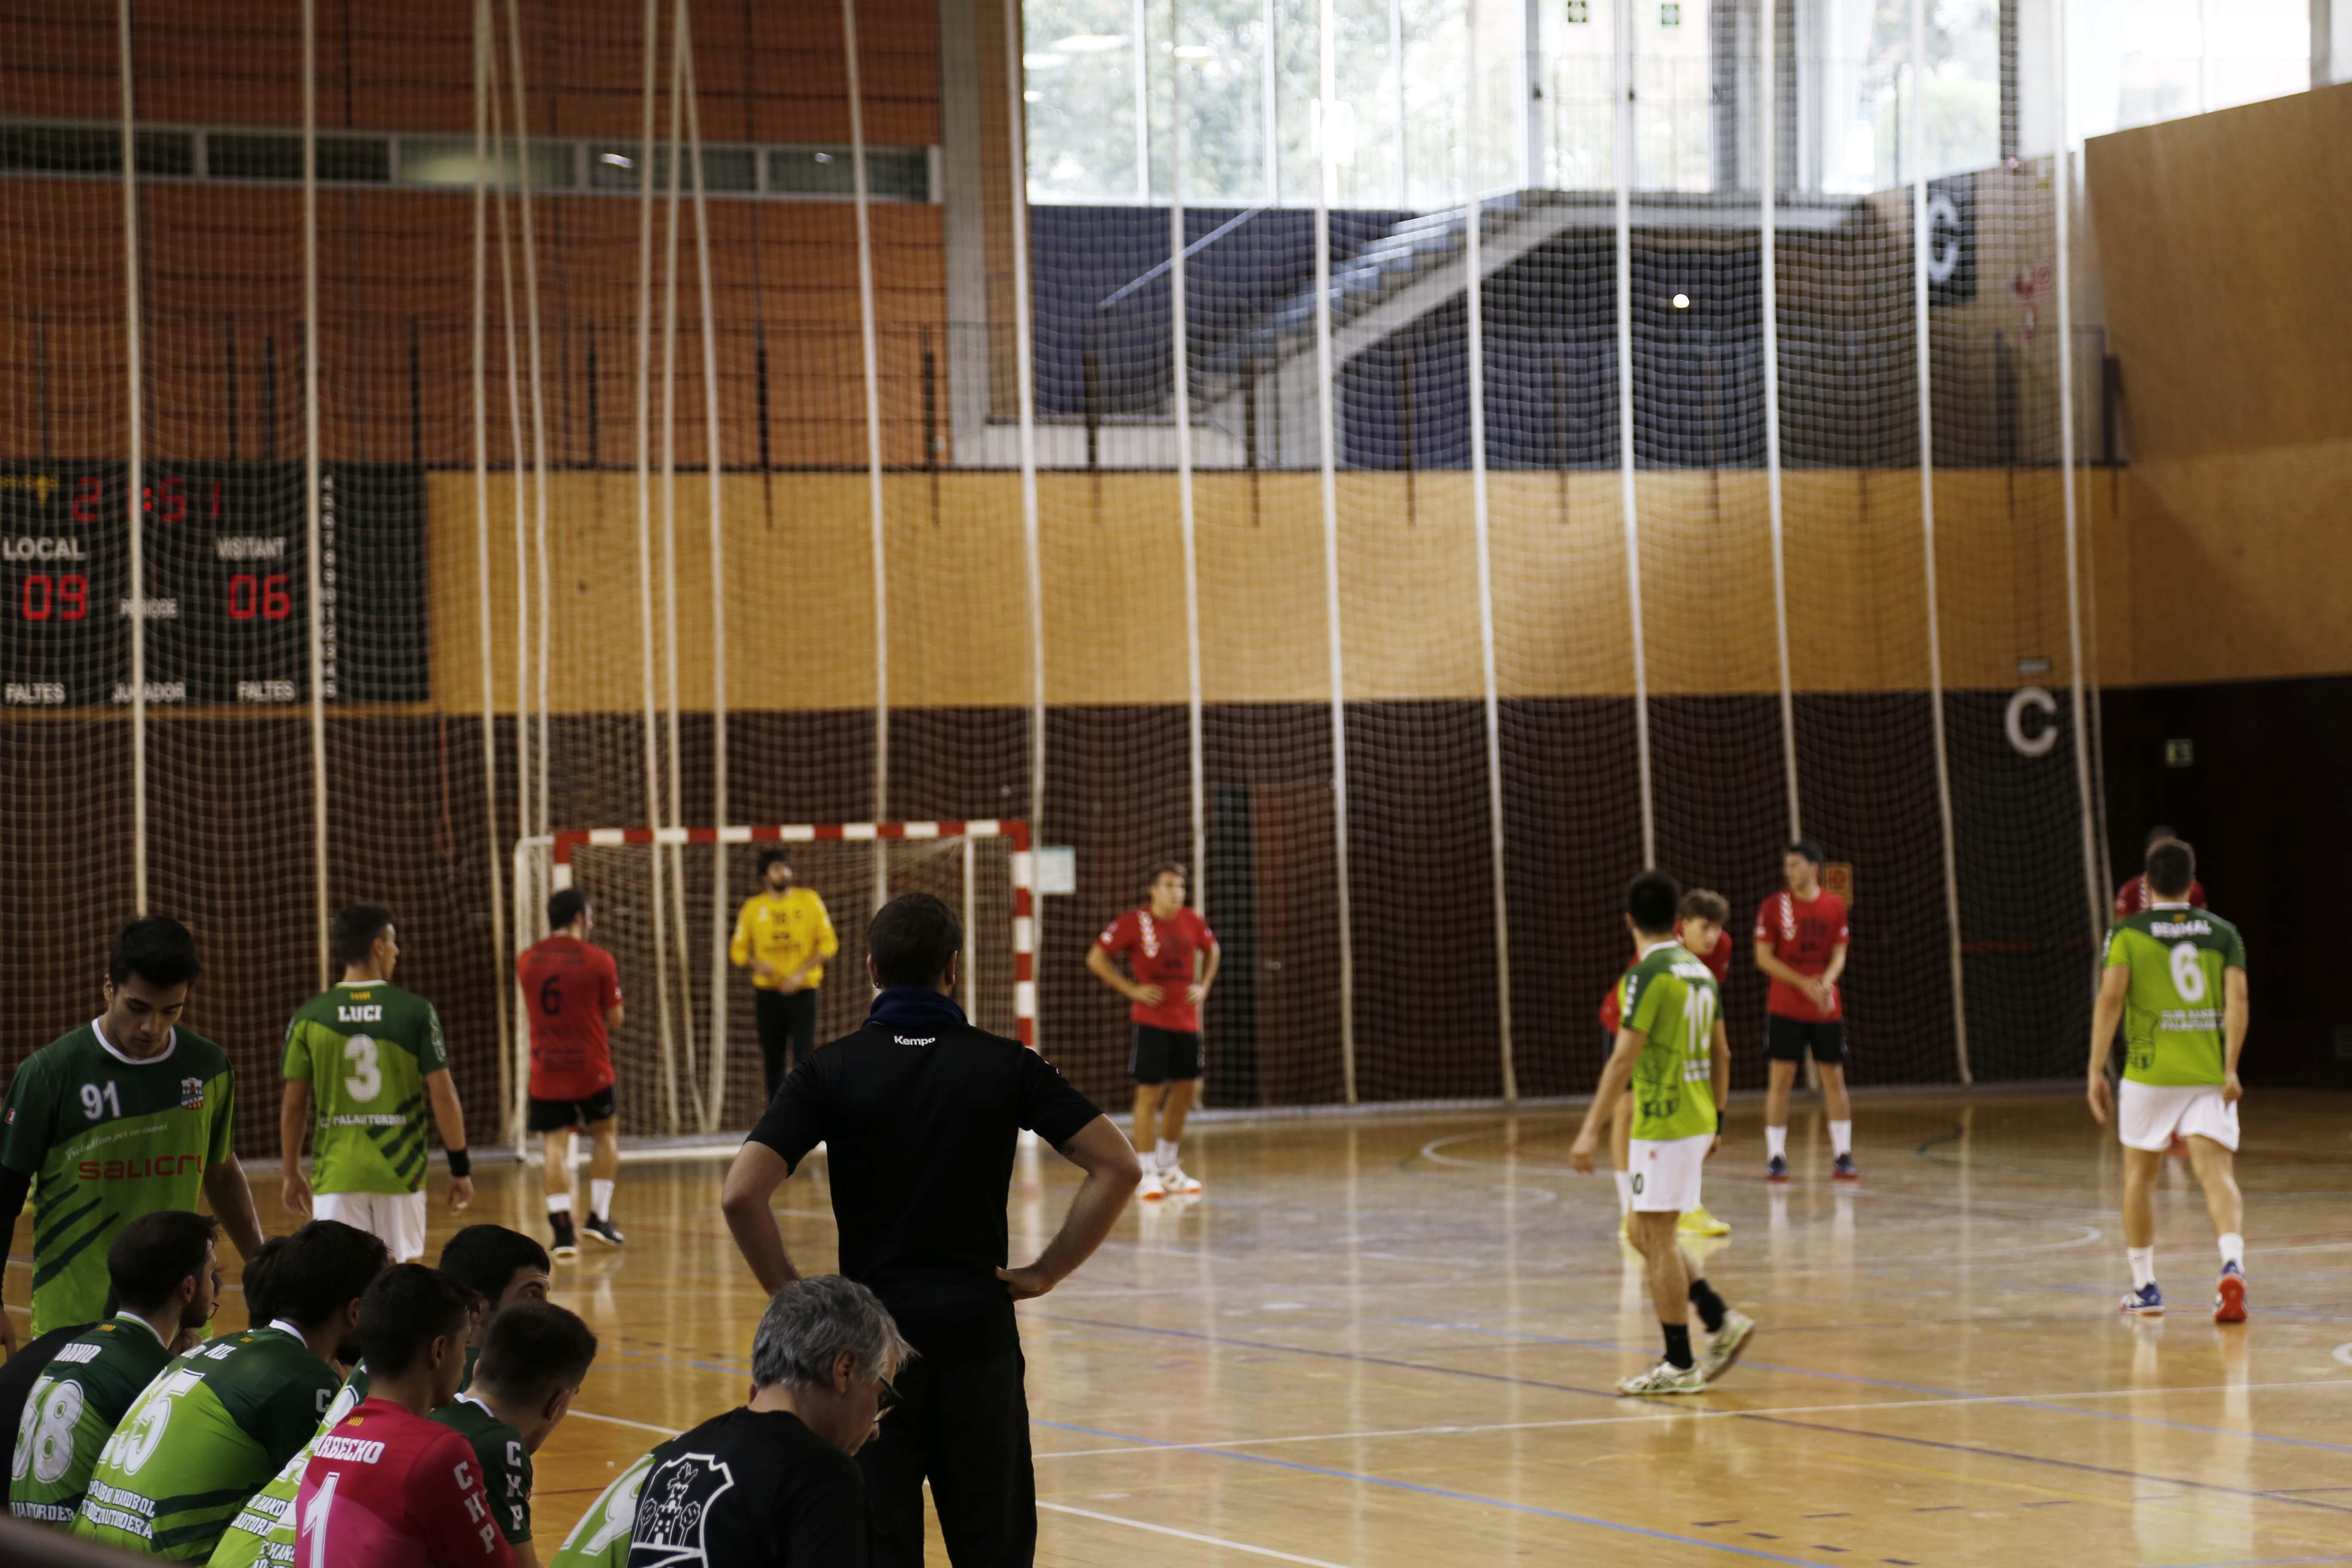 Handbol masculí. Partit de lliga. CH Sant Cugat- CH Palautordera. FOTO: Anna Bassa